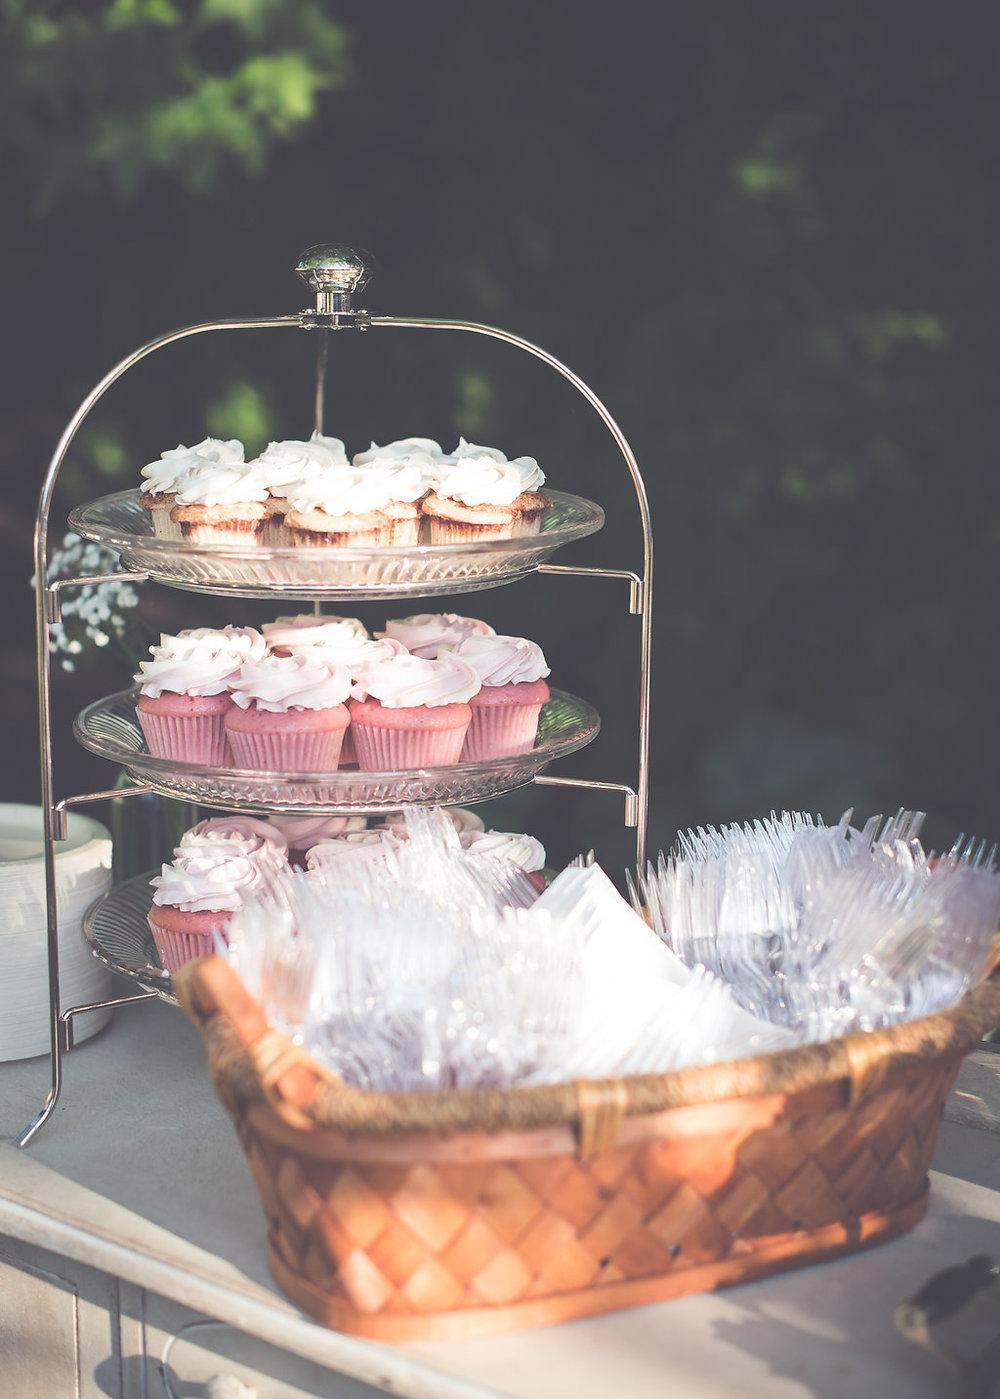 Cake-13.jpg